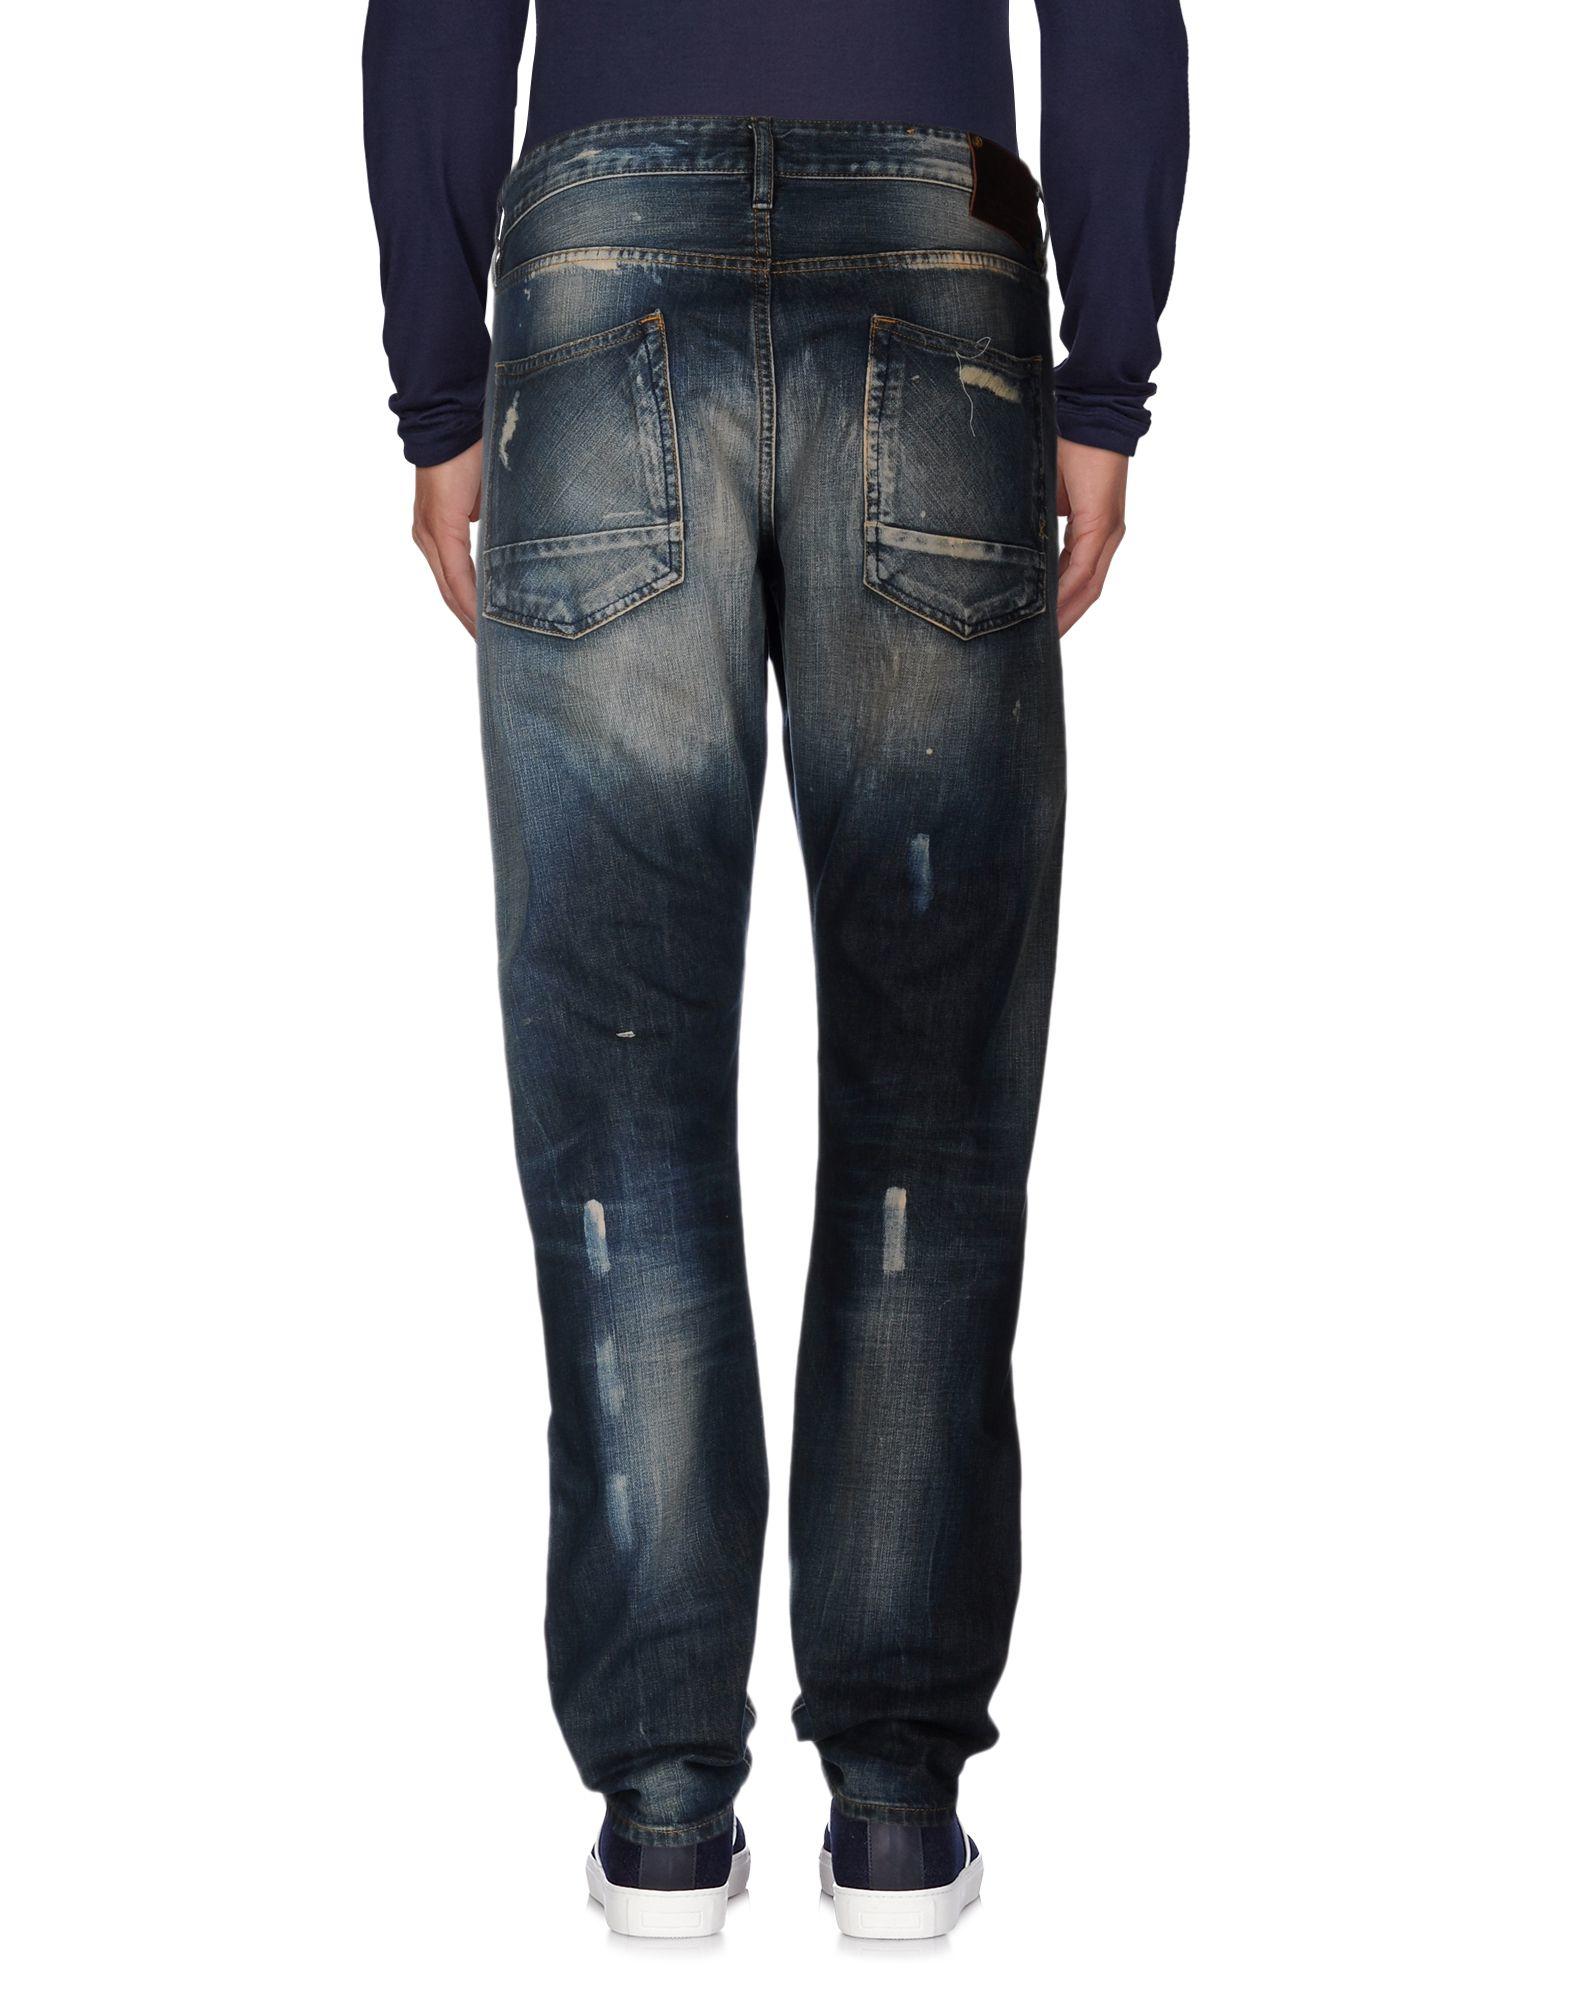 scotch and soda jeans herren fotos scotch soda jeans. Black Bedroom Furniture Sets. Home Design Ideas